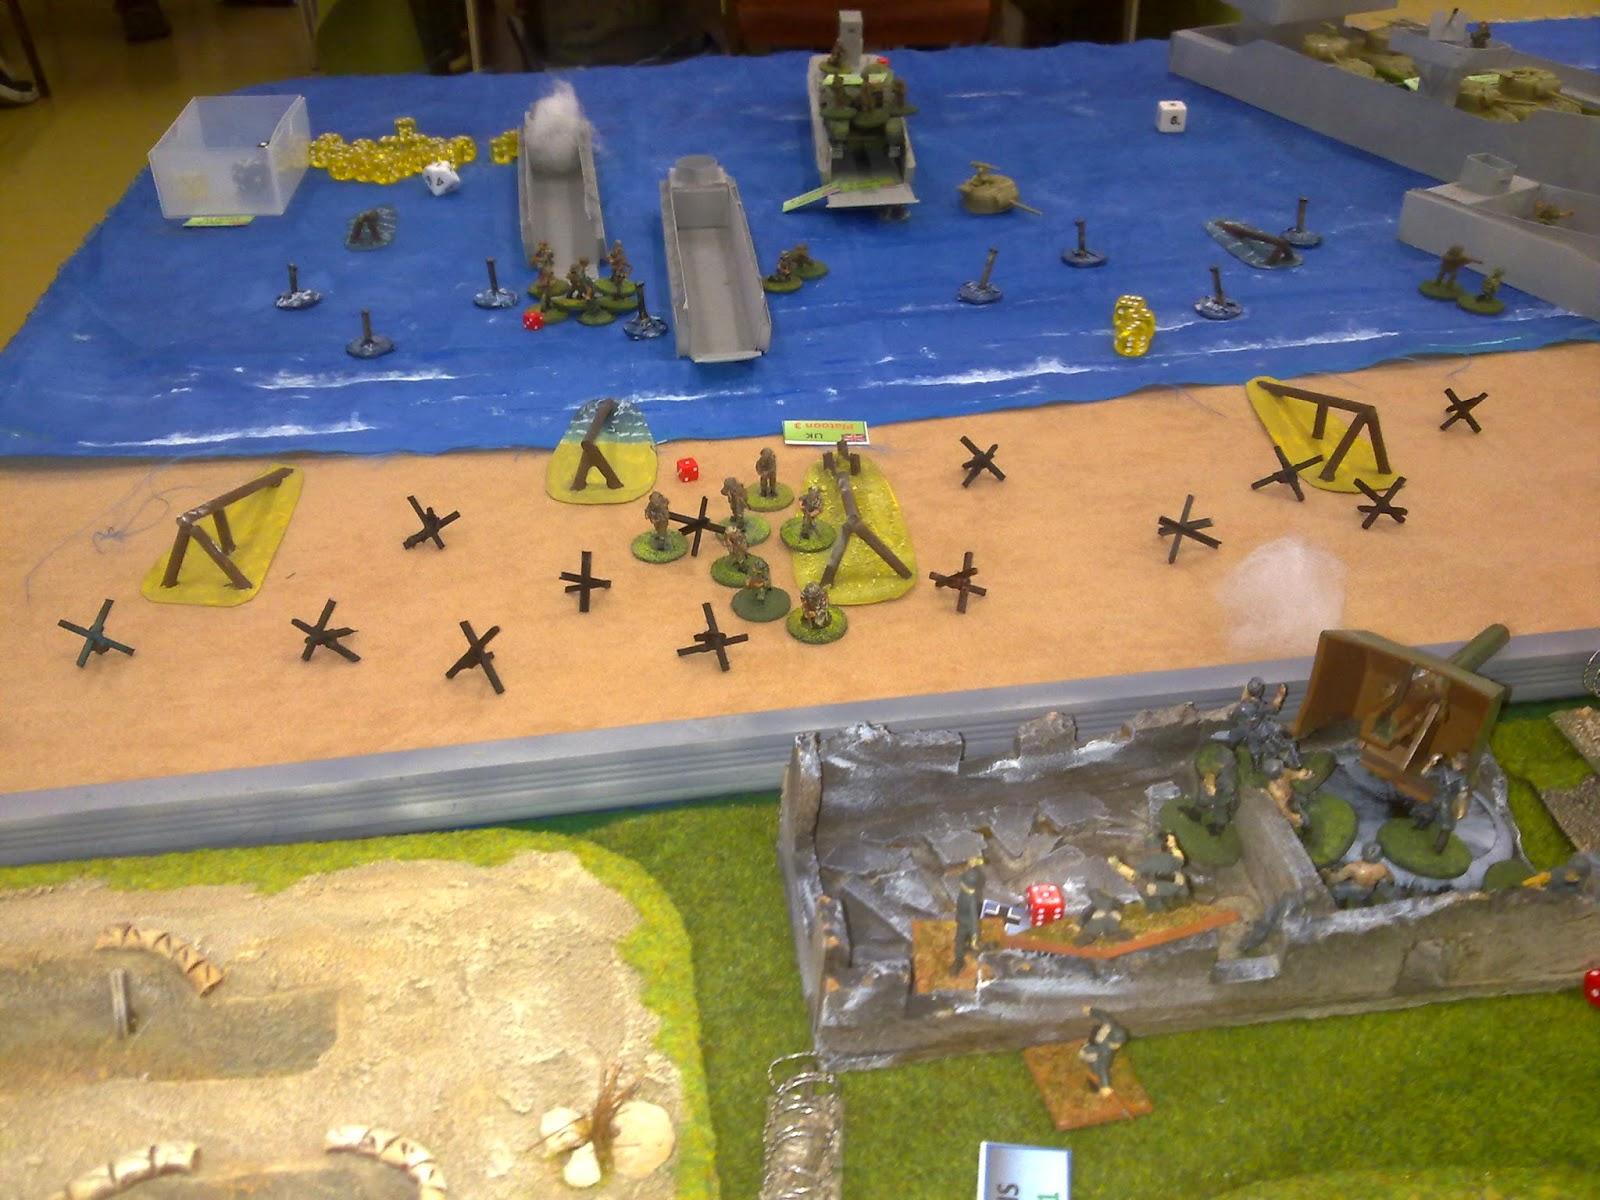 1st Platoon's Flank